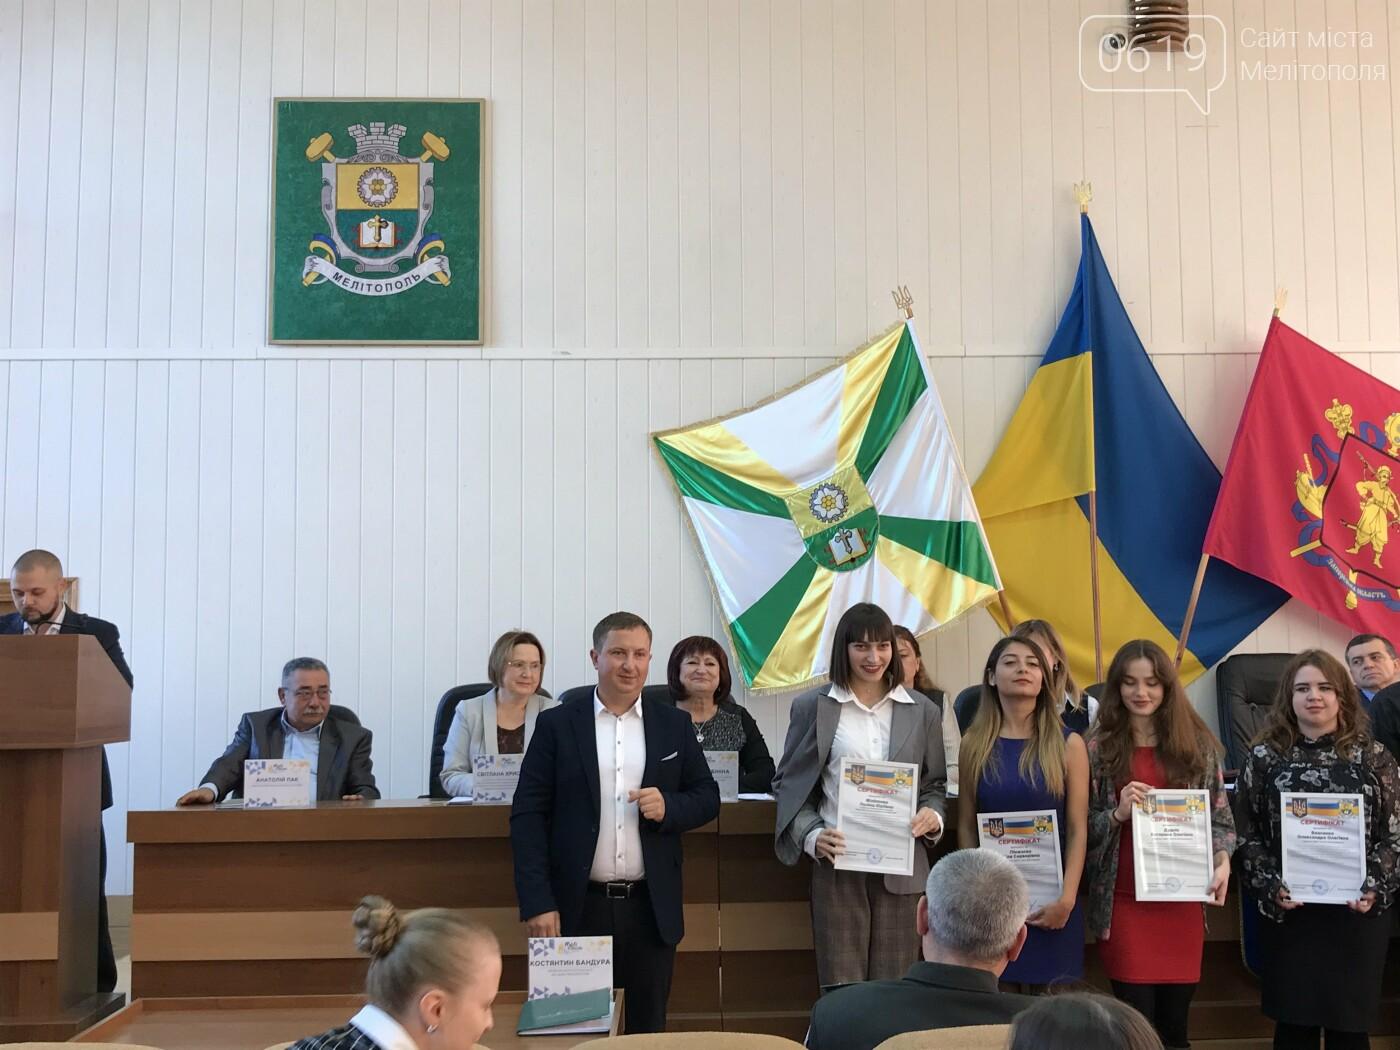 Одаренную молодежь Мелитополя наградили стипендиями мэра, фото-7